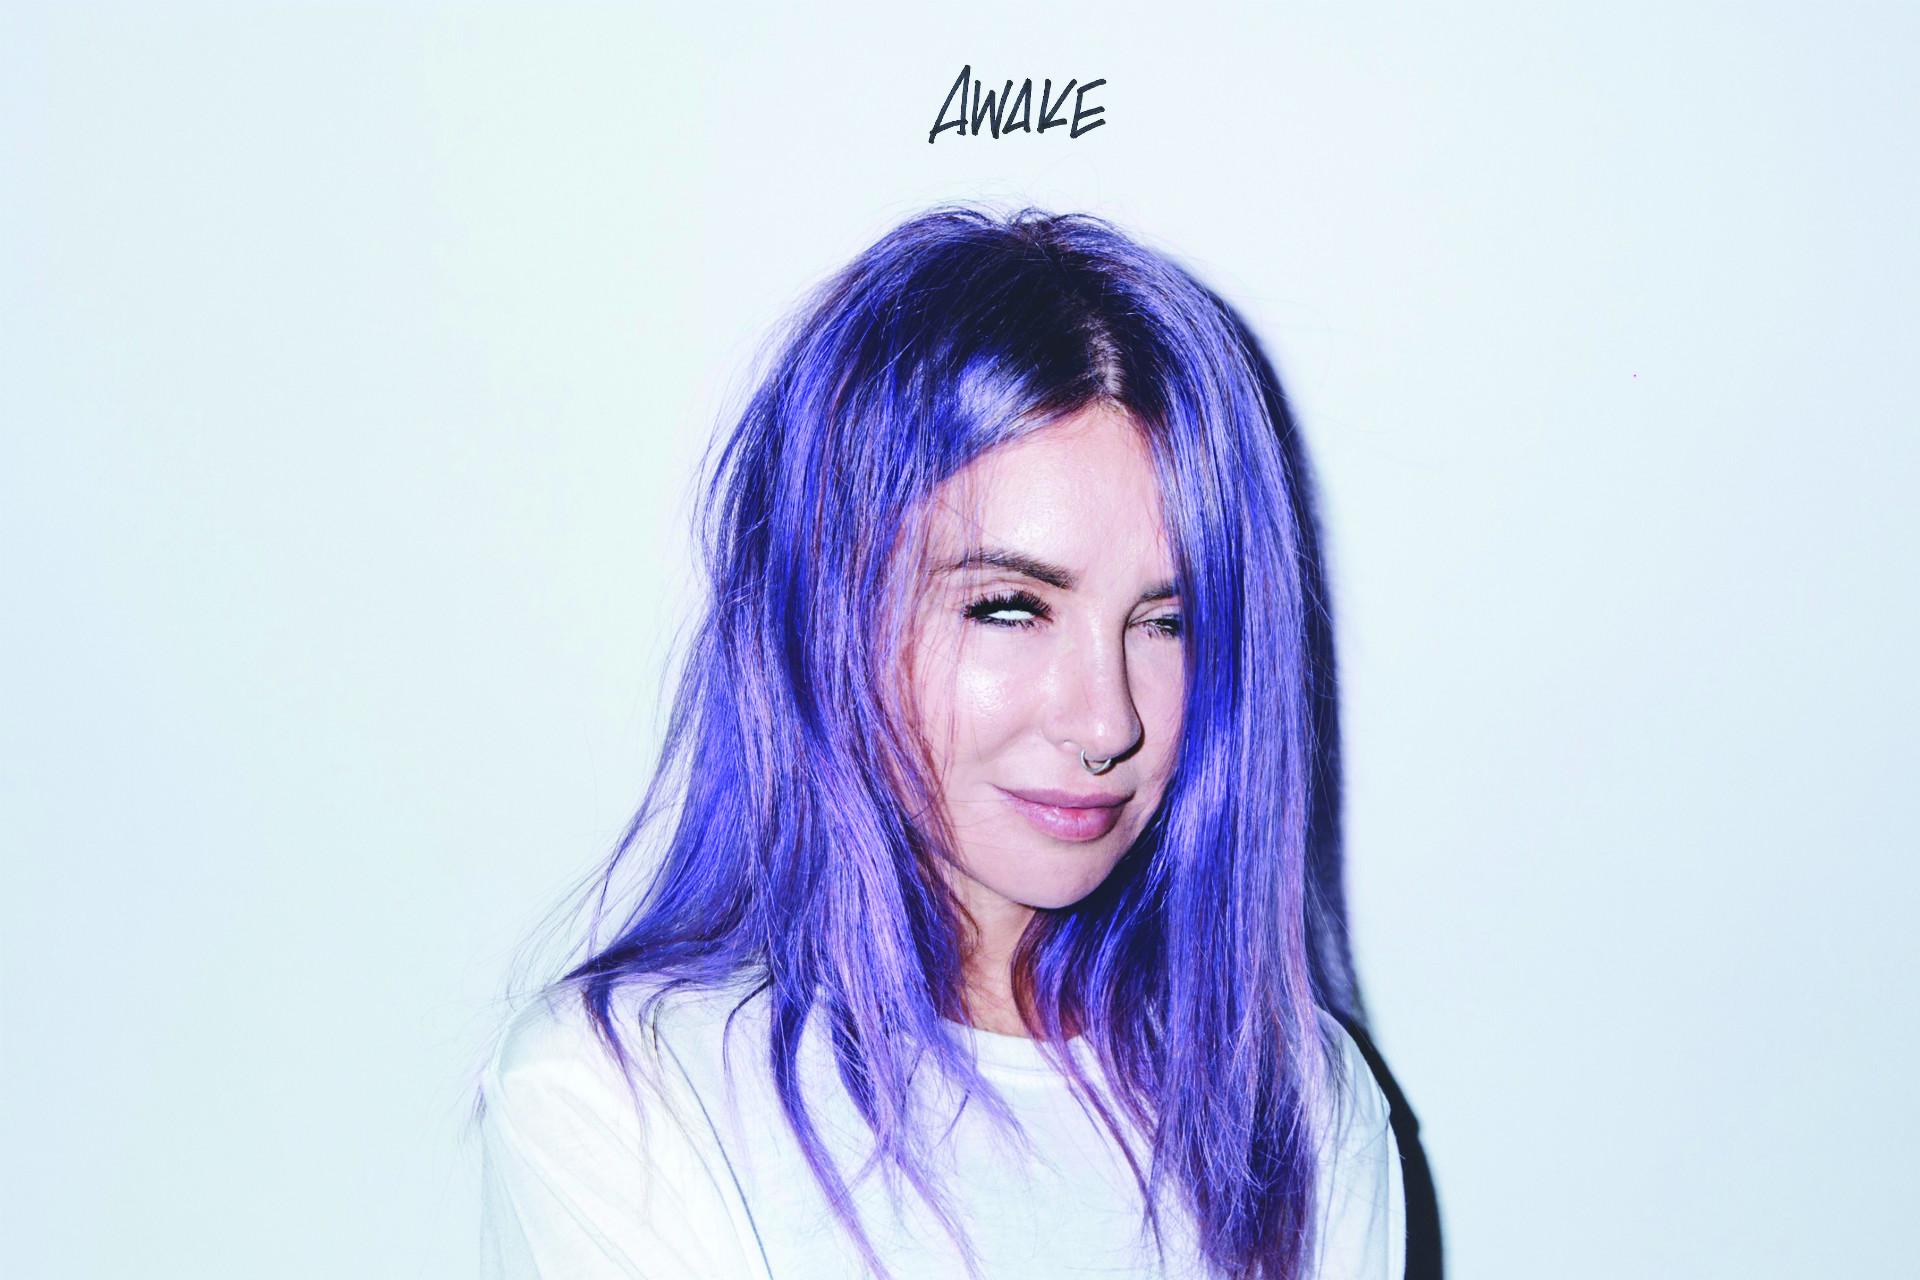 Album Review: Awake by Alison Wonderland